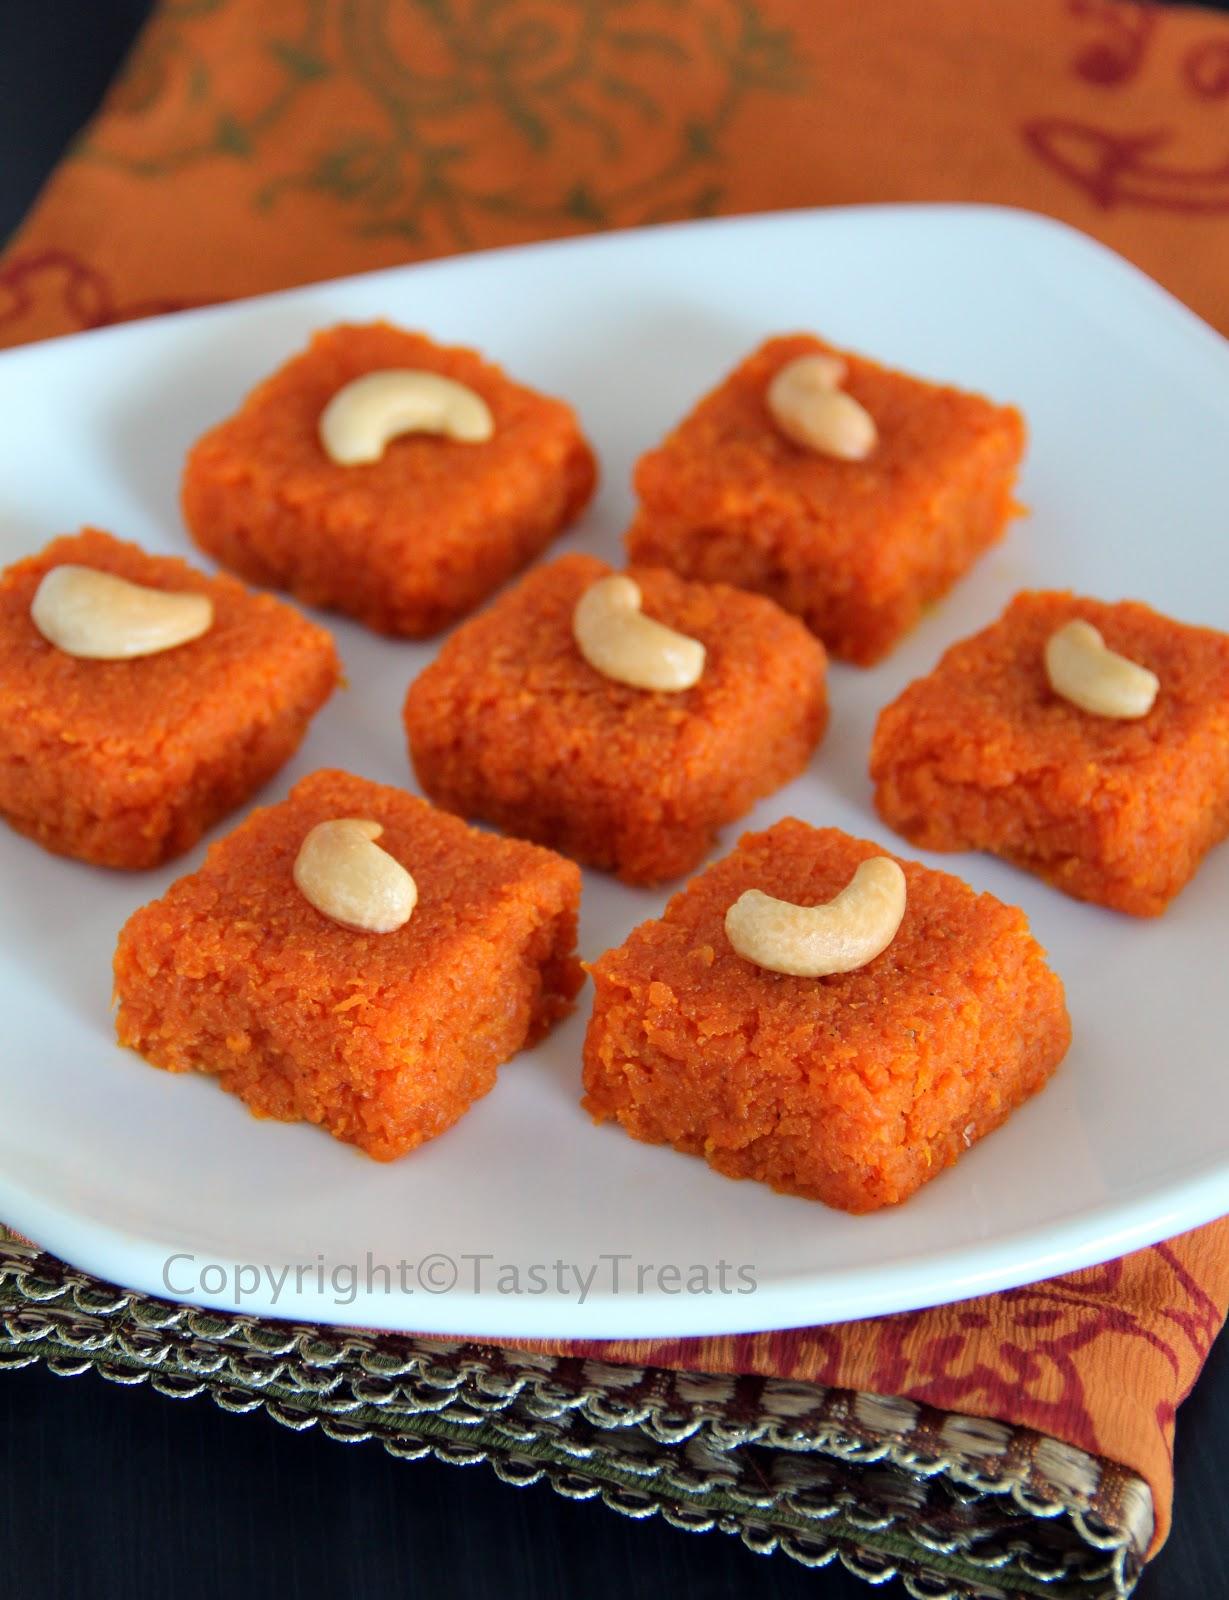 Tasty Treats Gajar Carrot Burfi